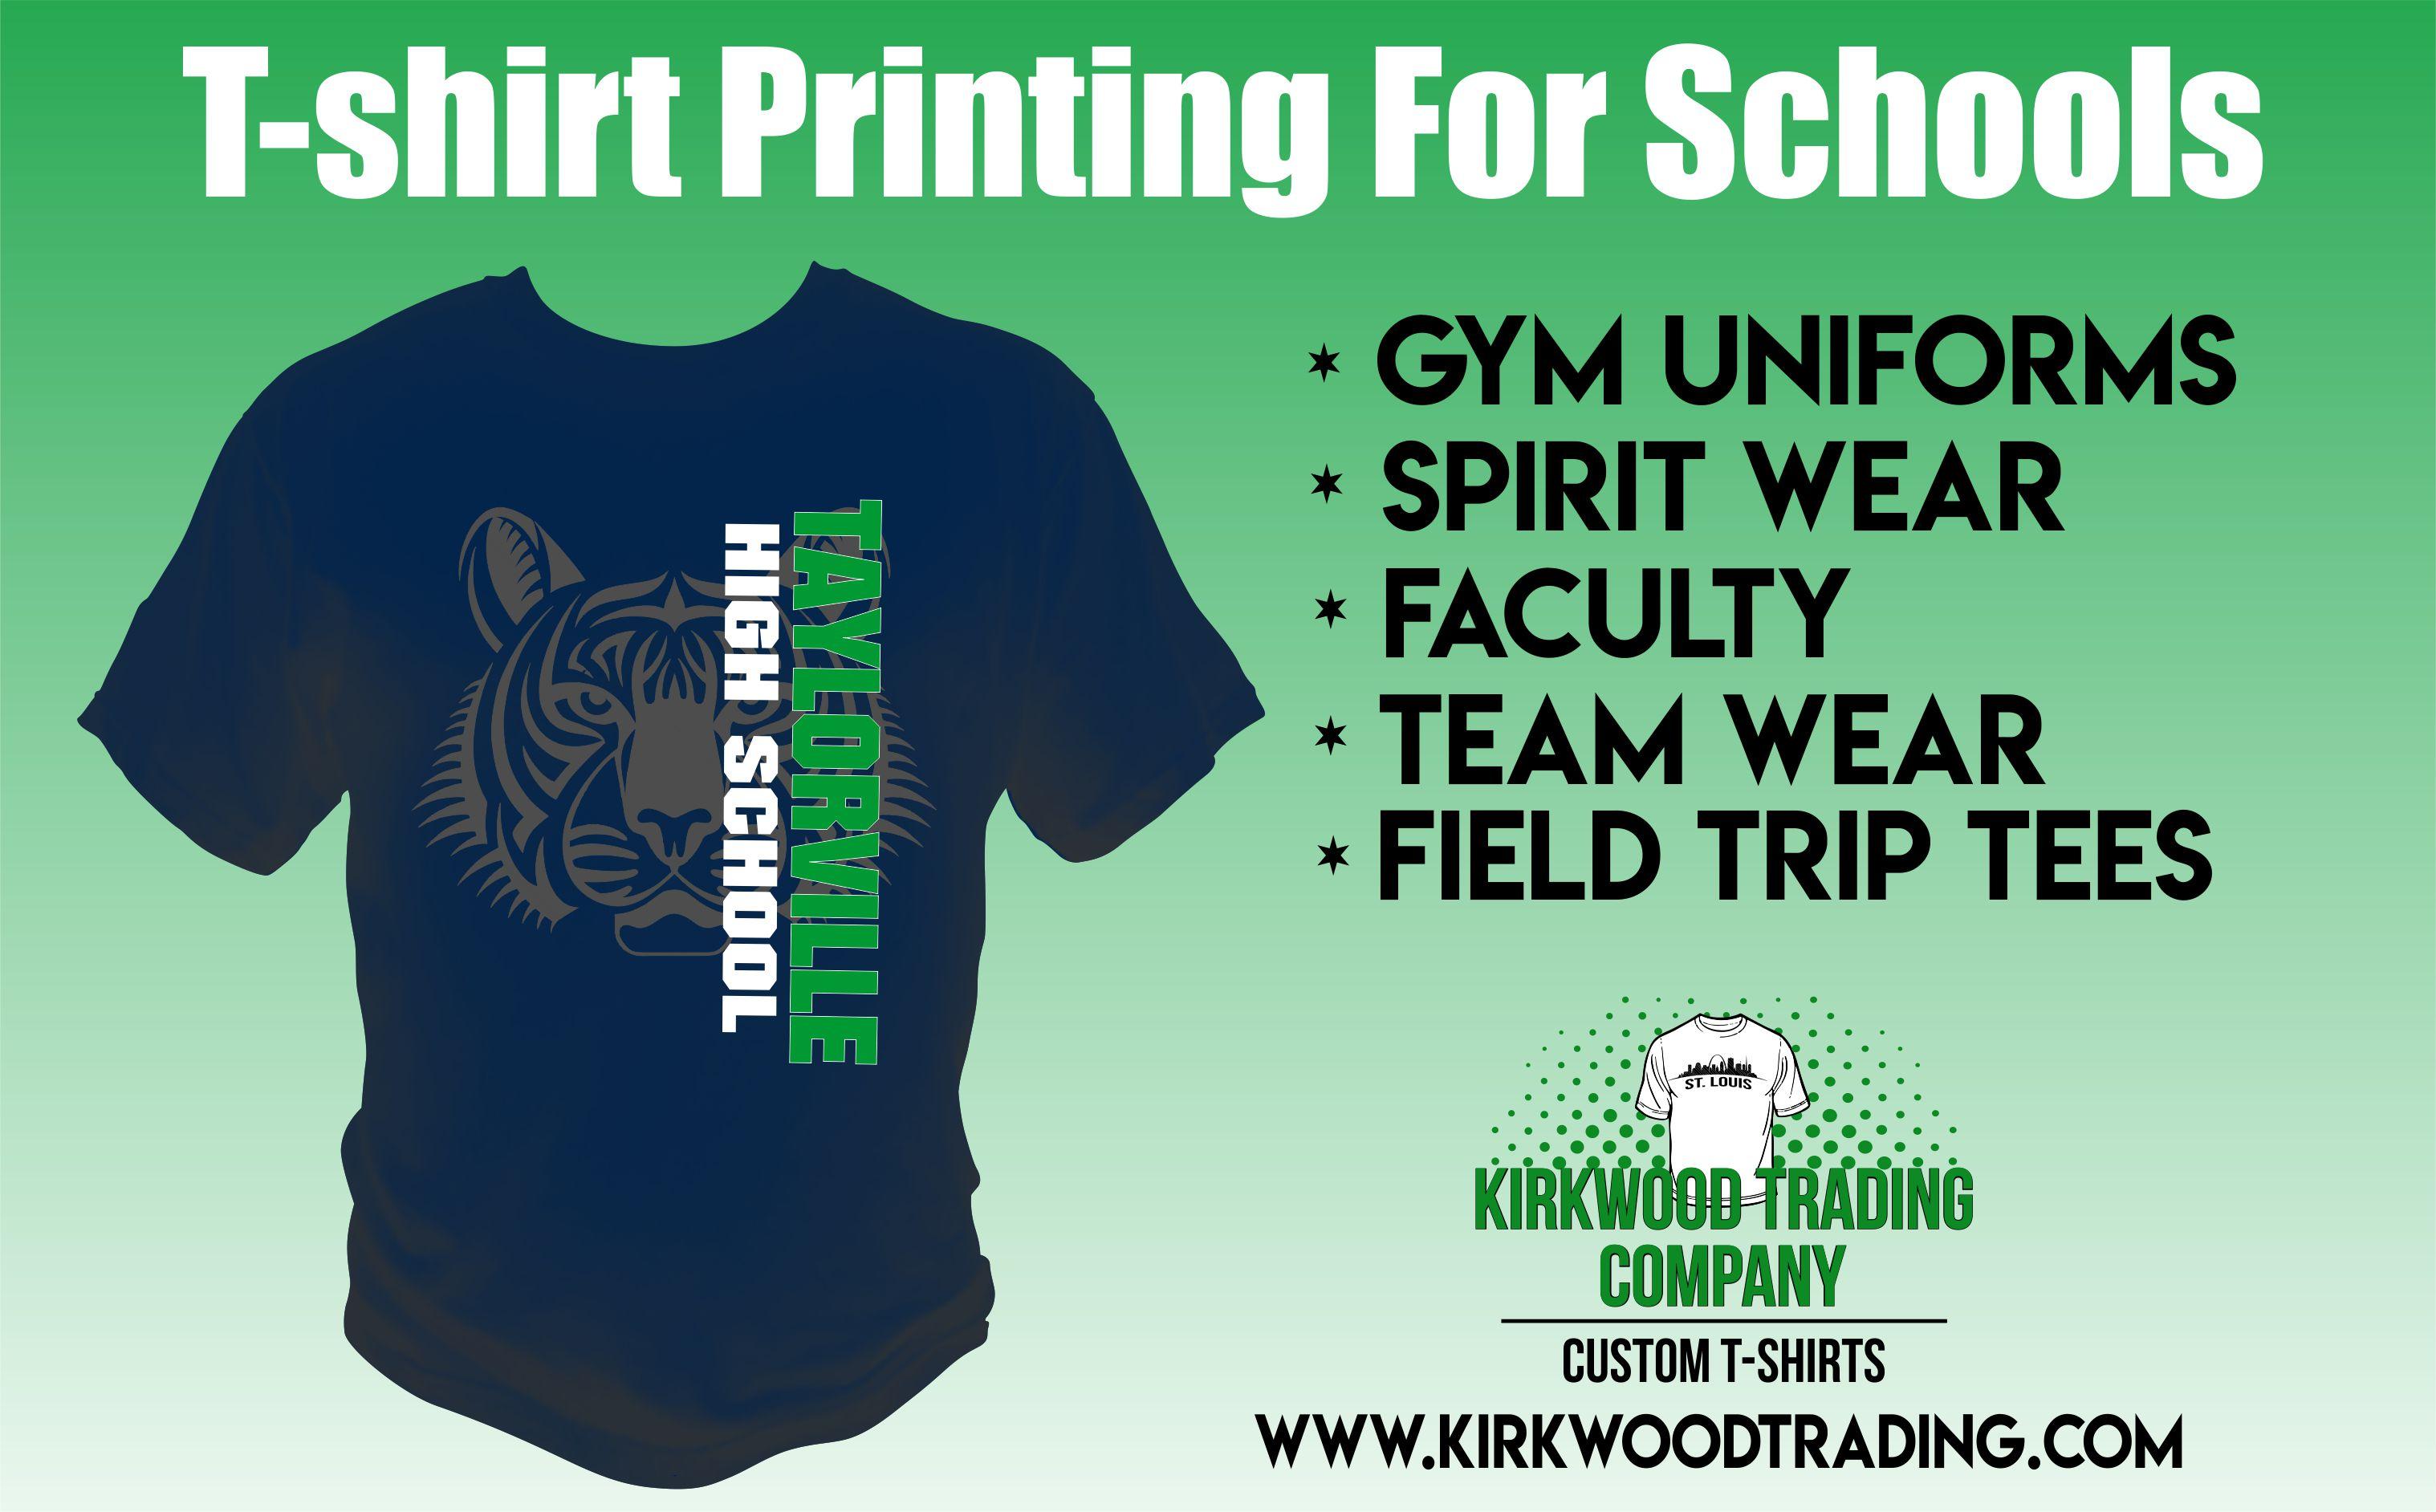 T shirt printing for schools kirkwood trading company for Company t shirt printing